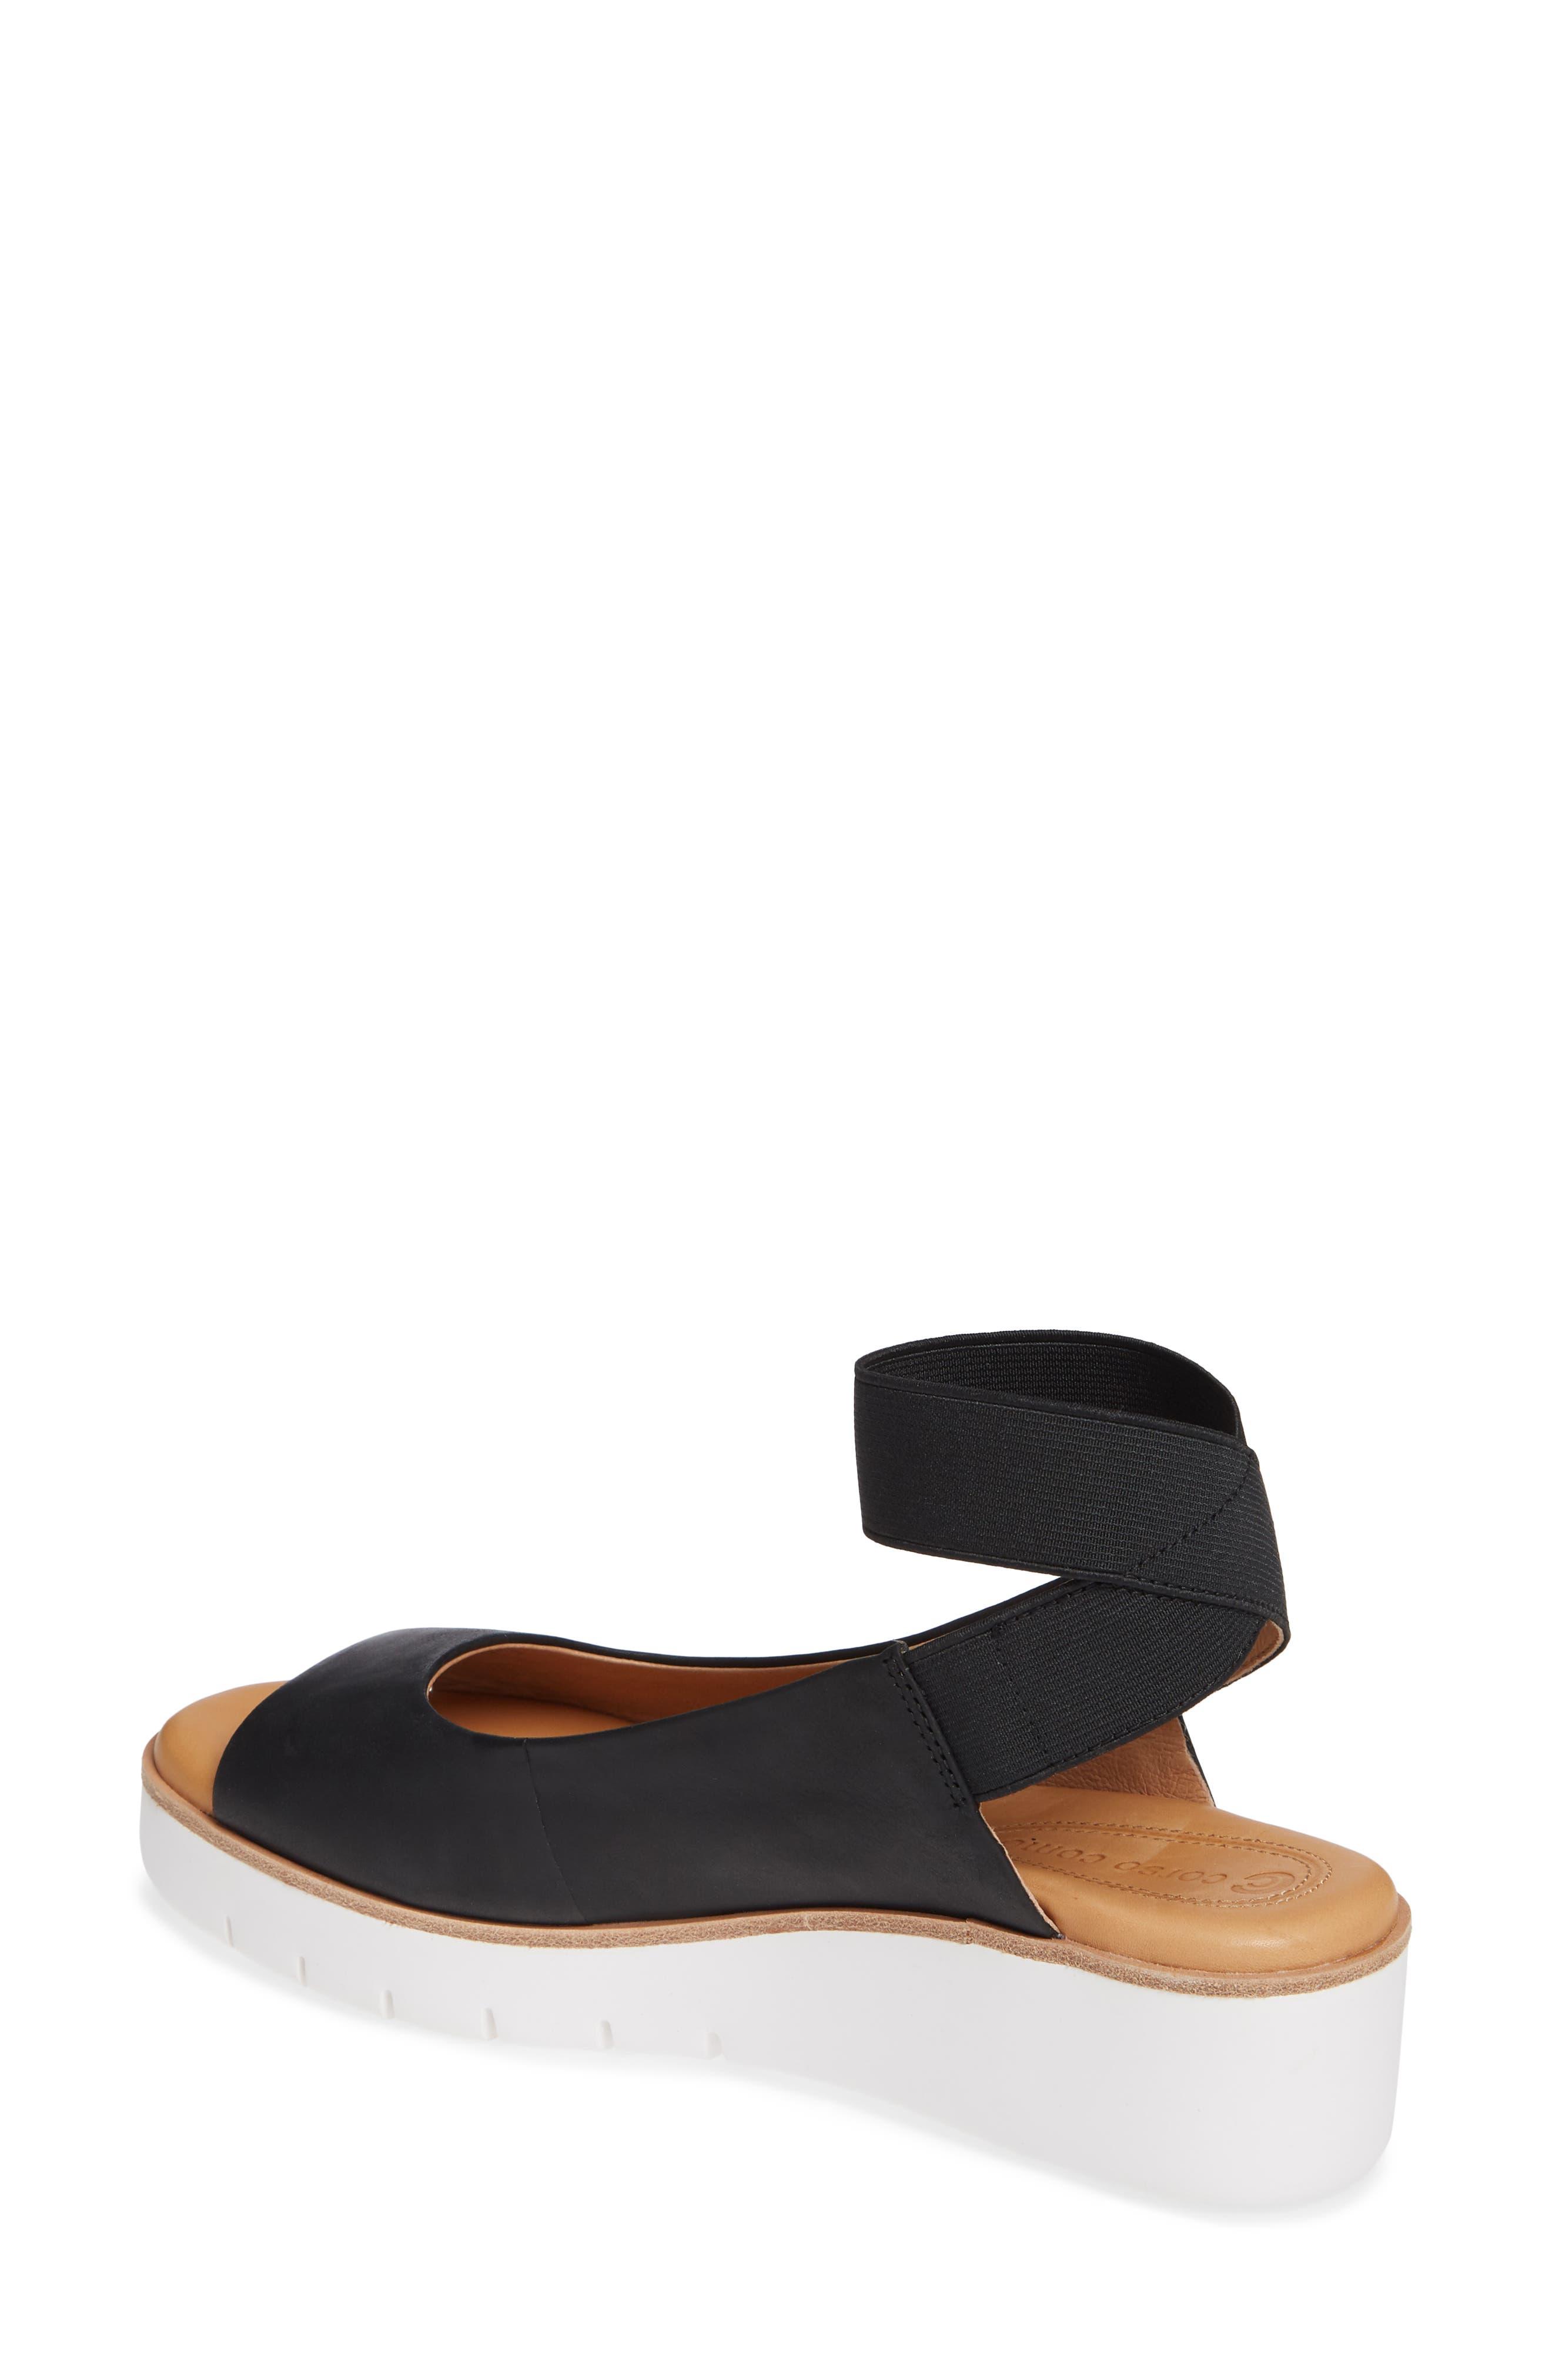 Beeata Wedge Sandal,                             Alternate thumbnail 2, color,                             BLACK LEATHER